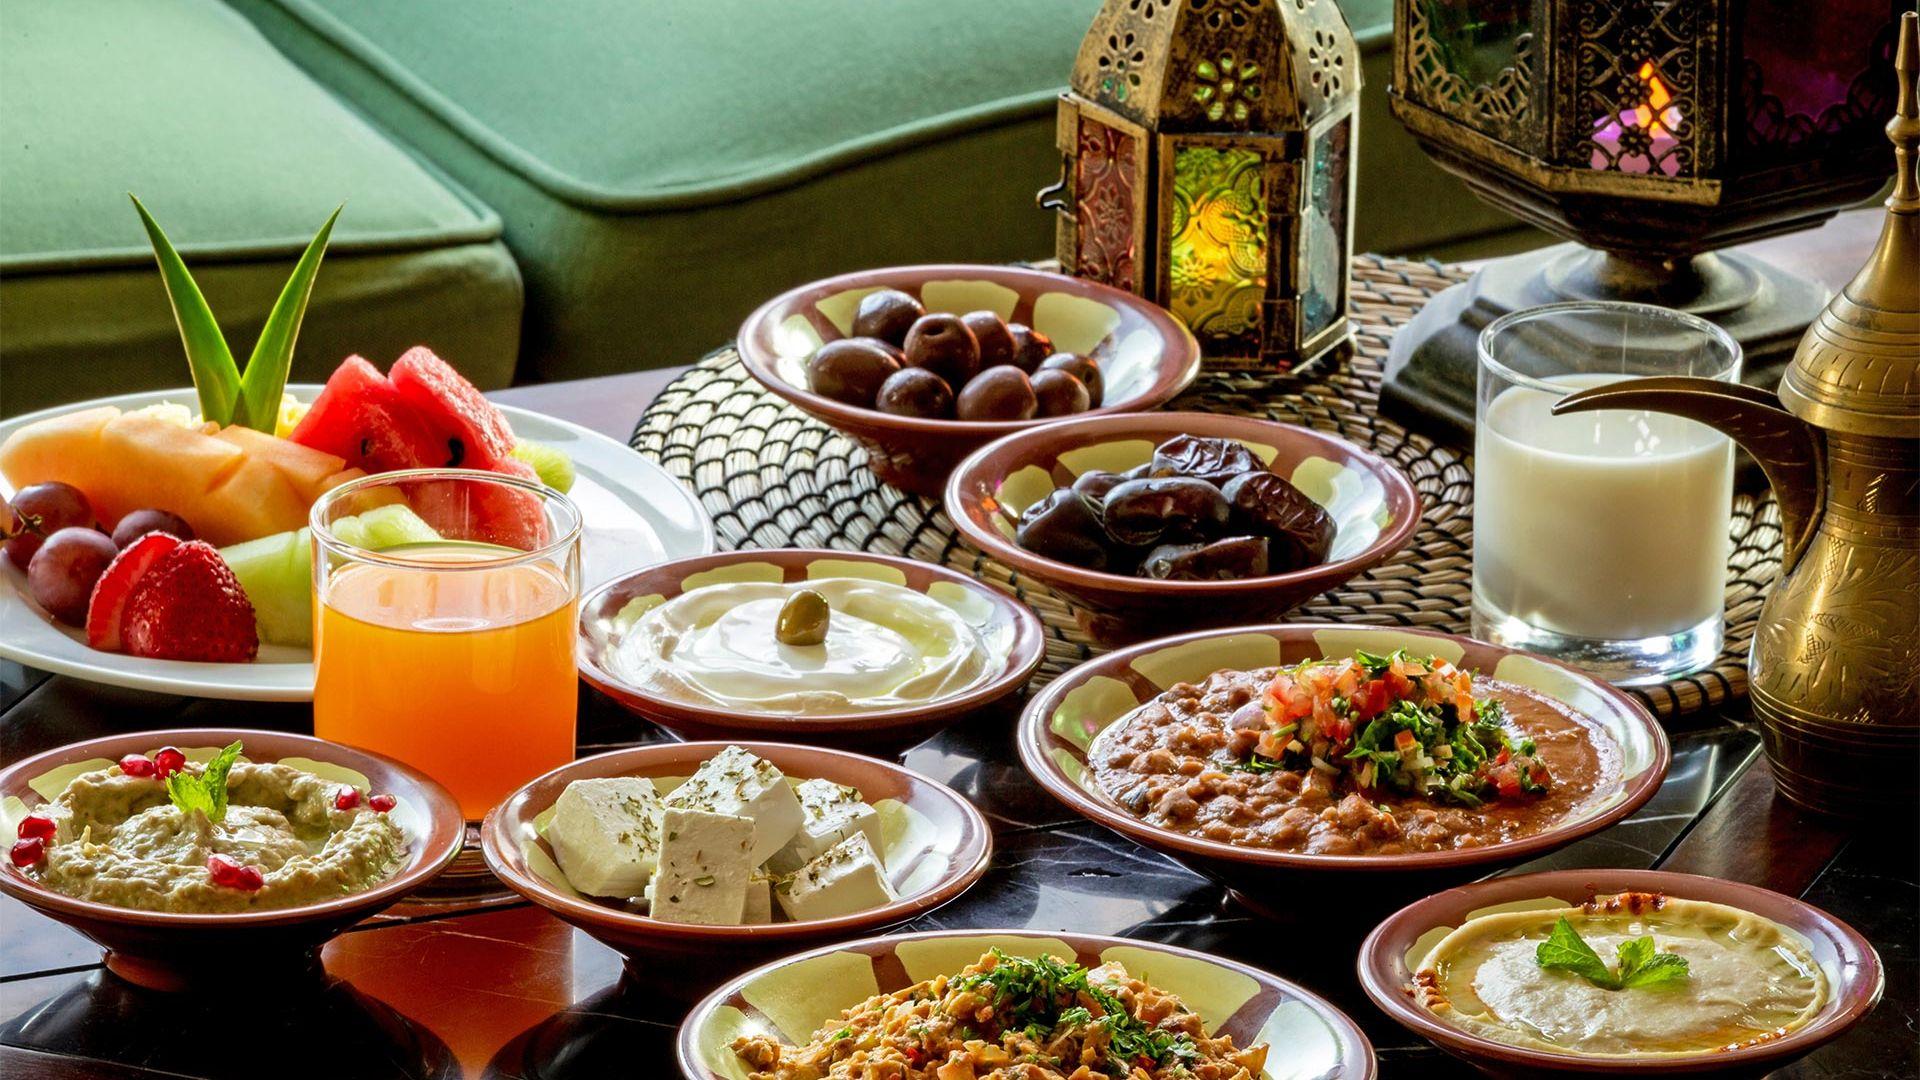 Craciun 2021 - Sejur charter Ras Al Khaimah & Dubai, EAU, 7 zile